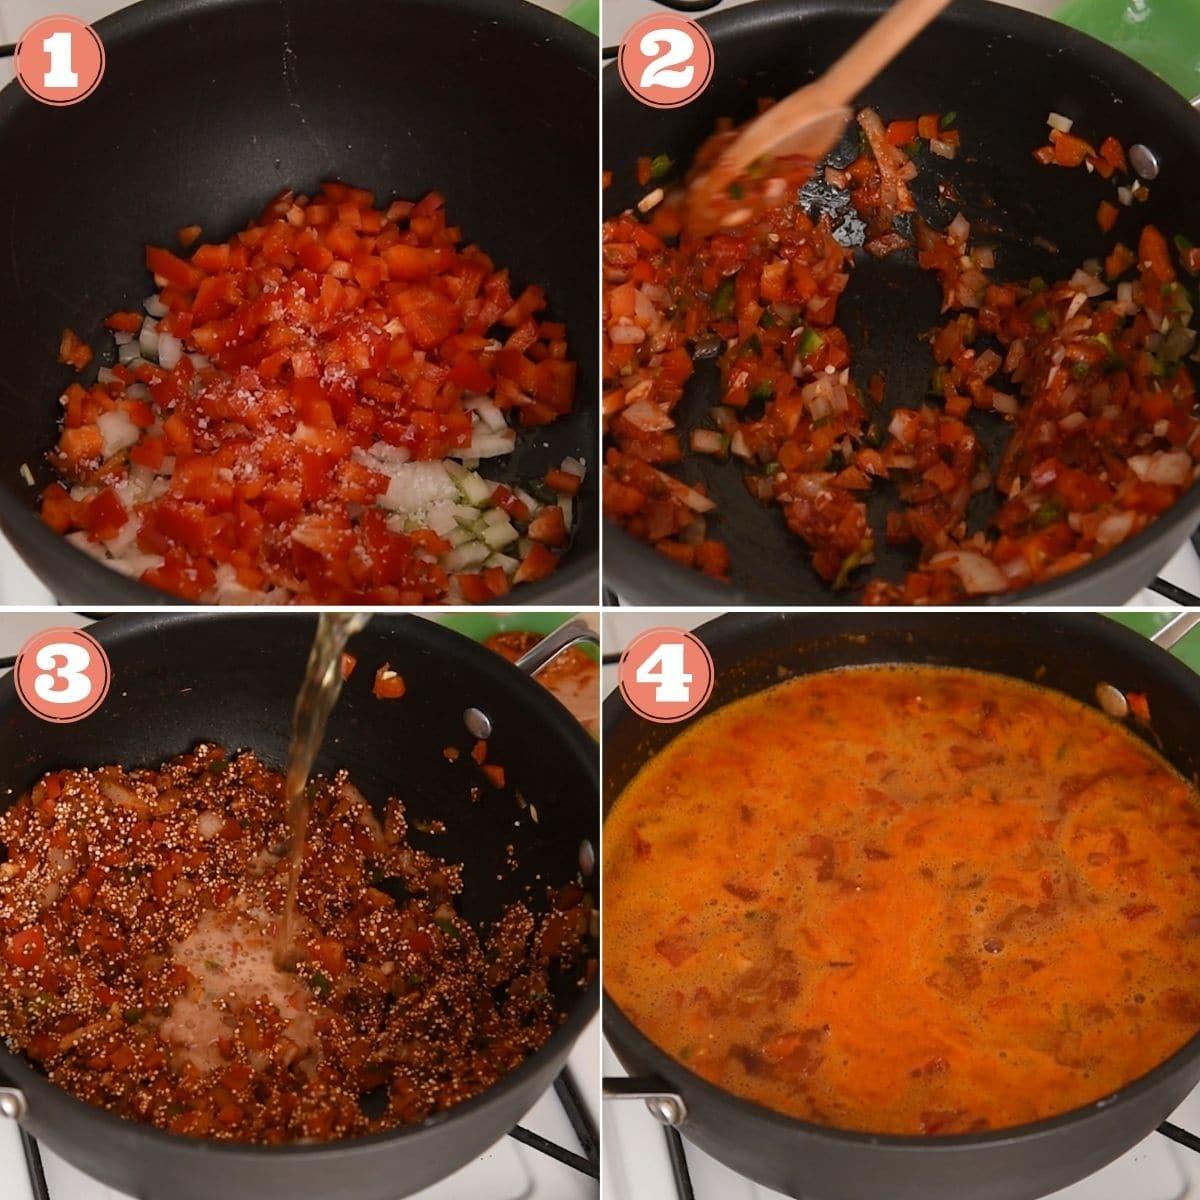 Steps 1 through 4 to make quinoa chili